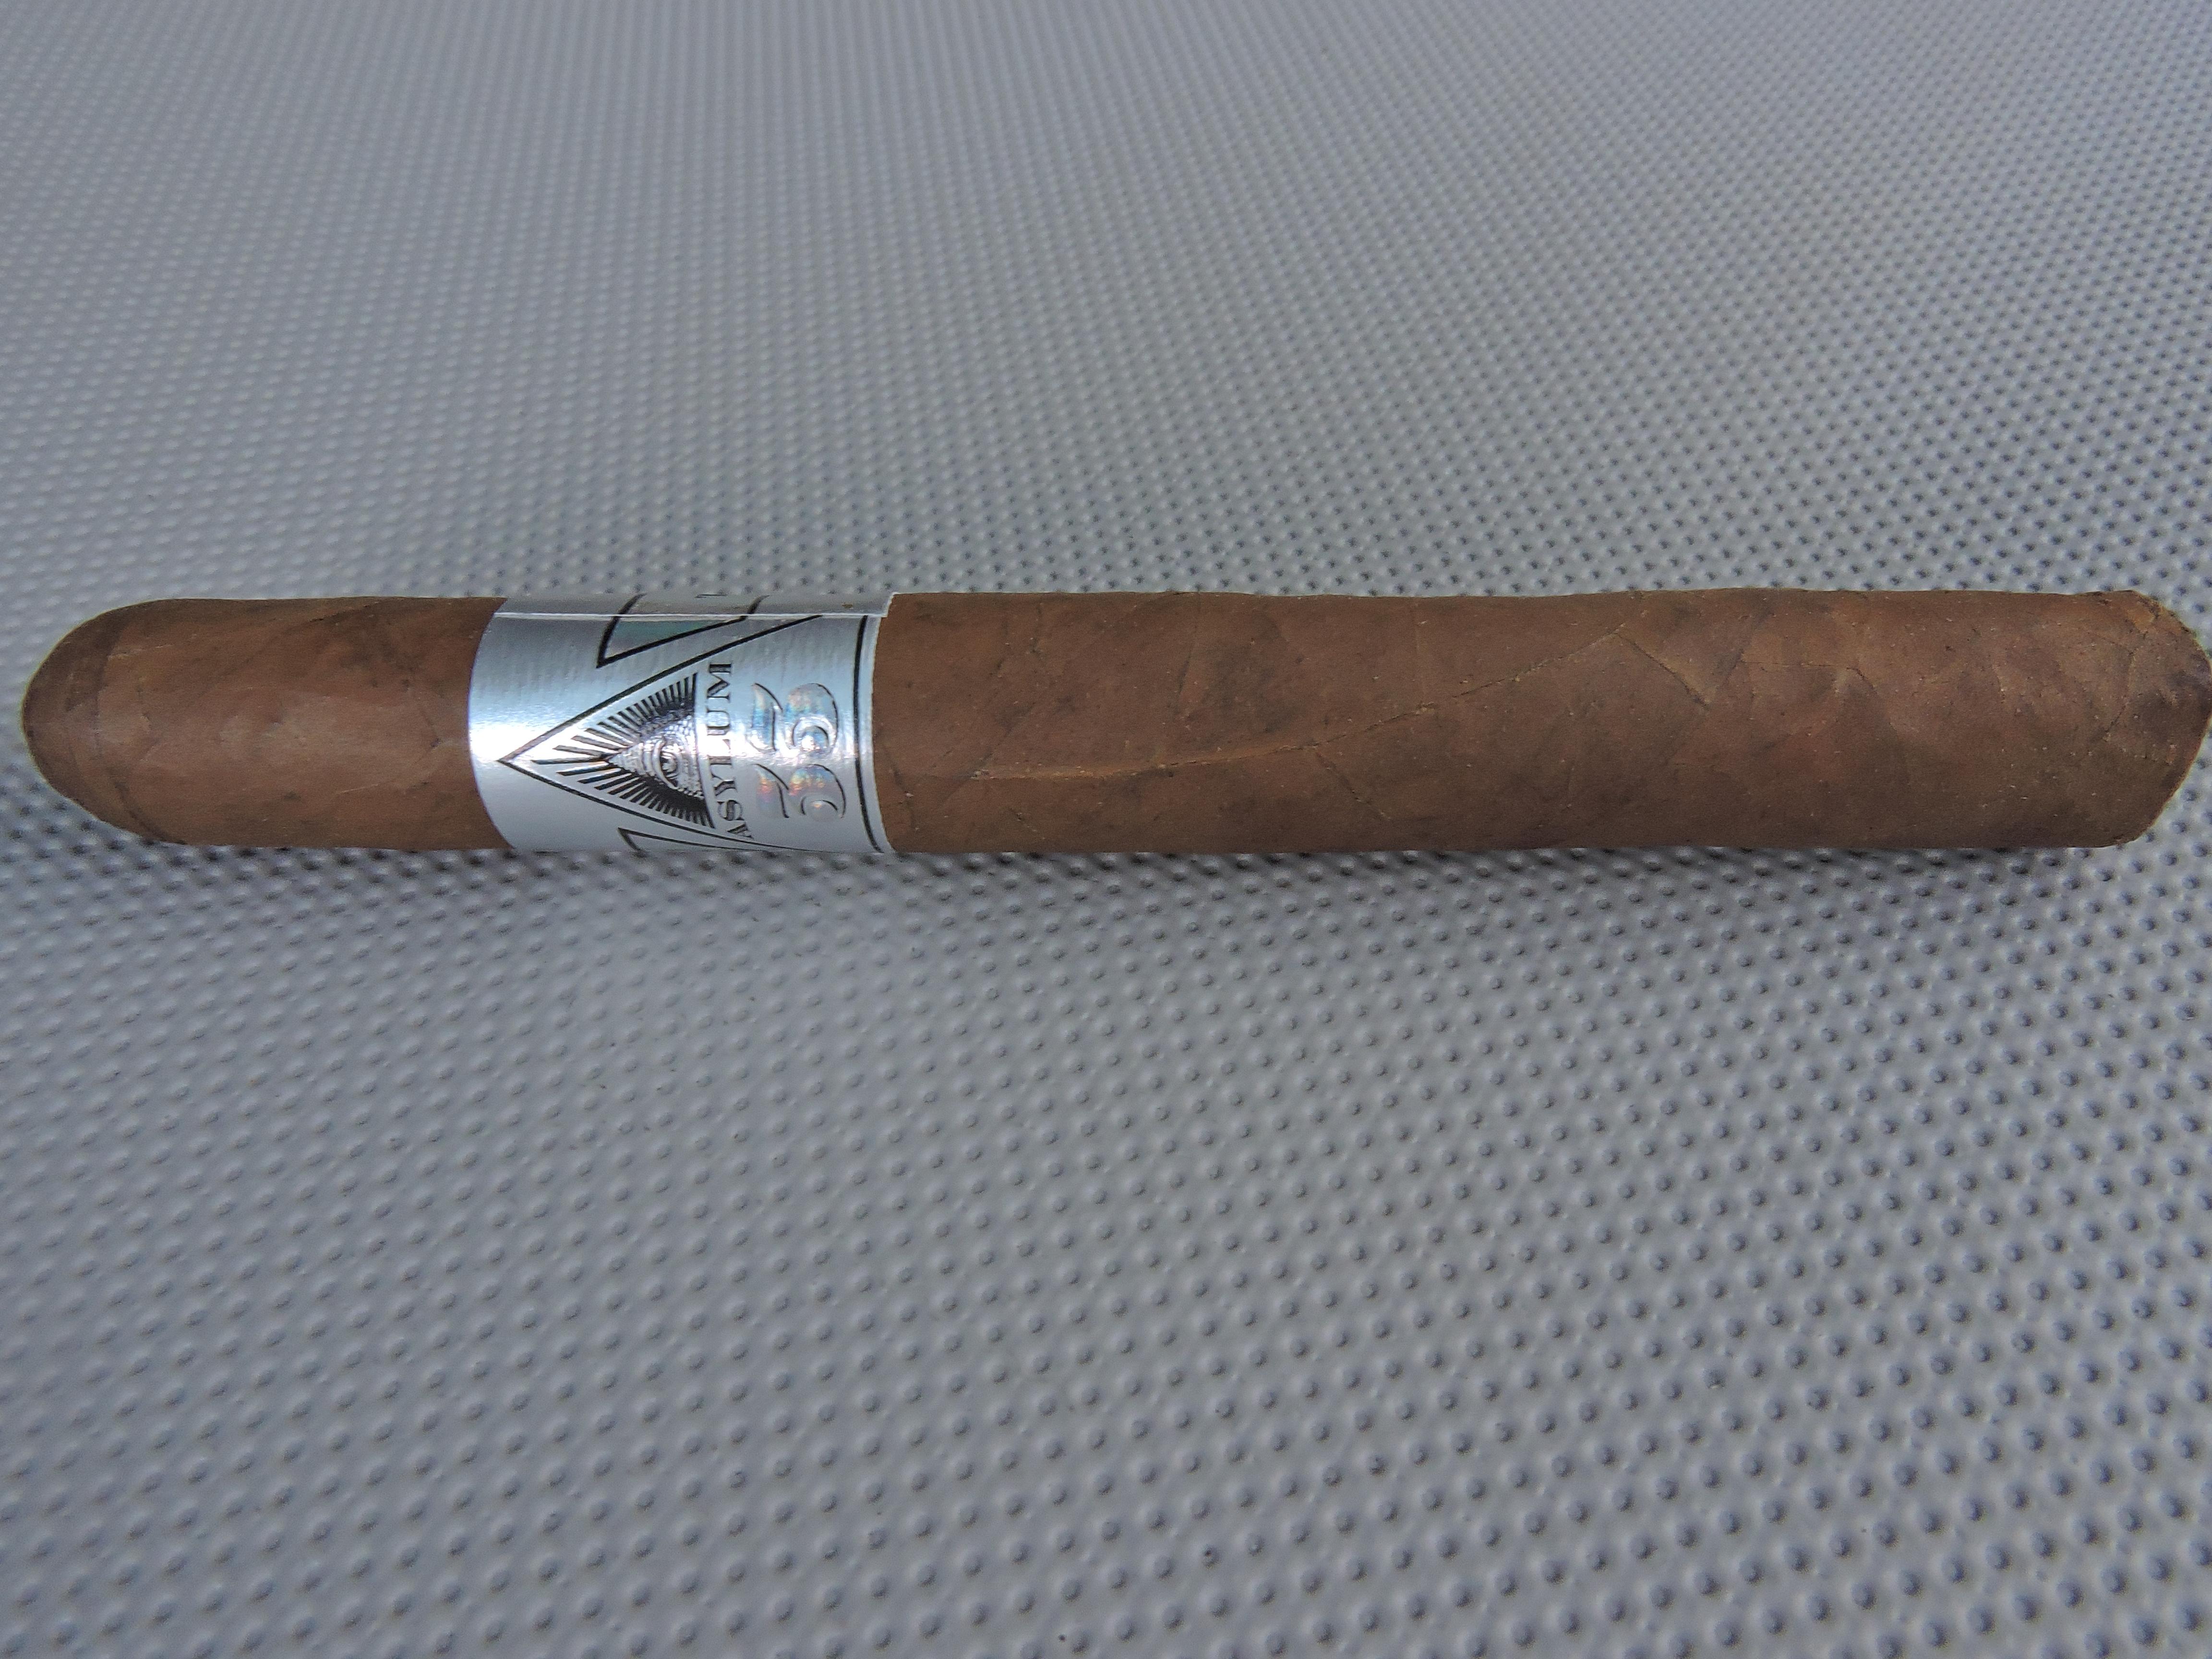 Cigar Review: Asylum 33 5 1/2 x 46 (2015)